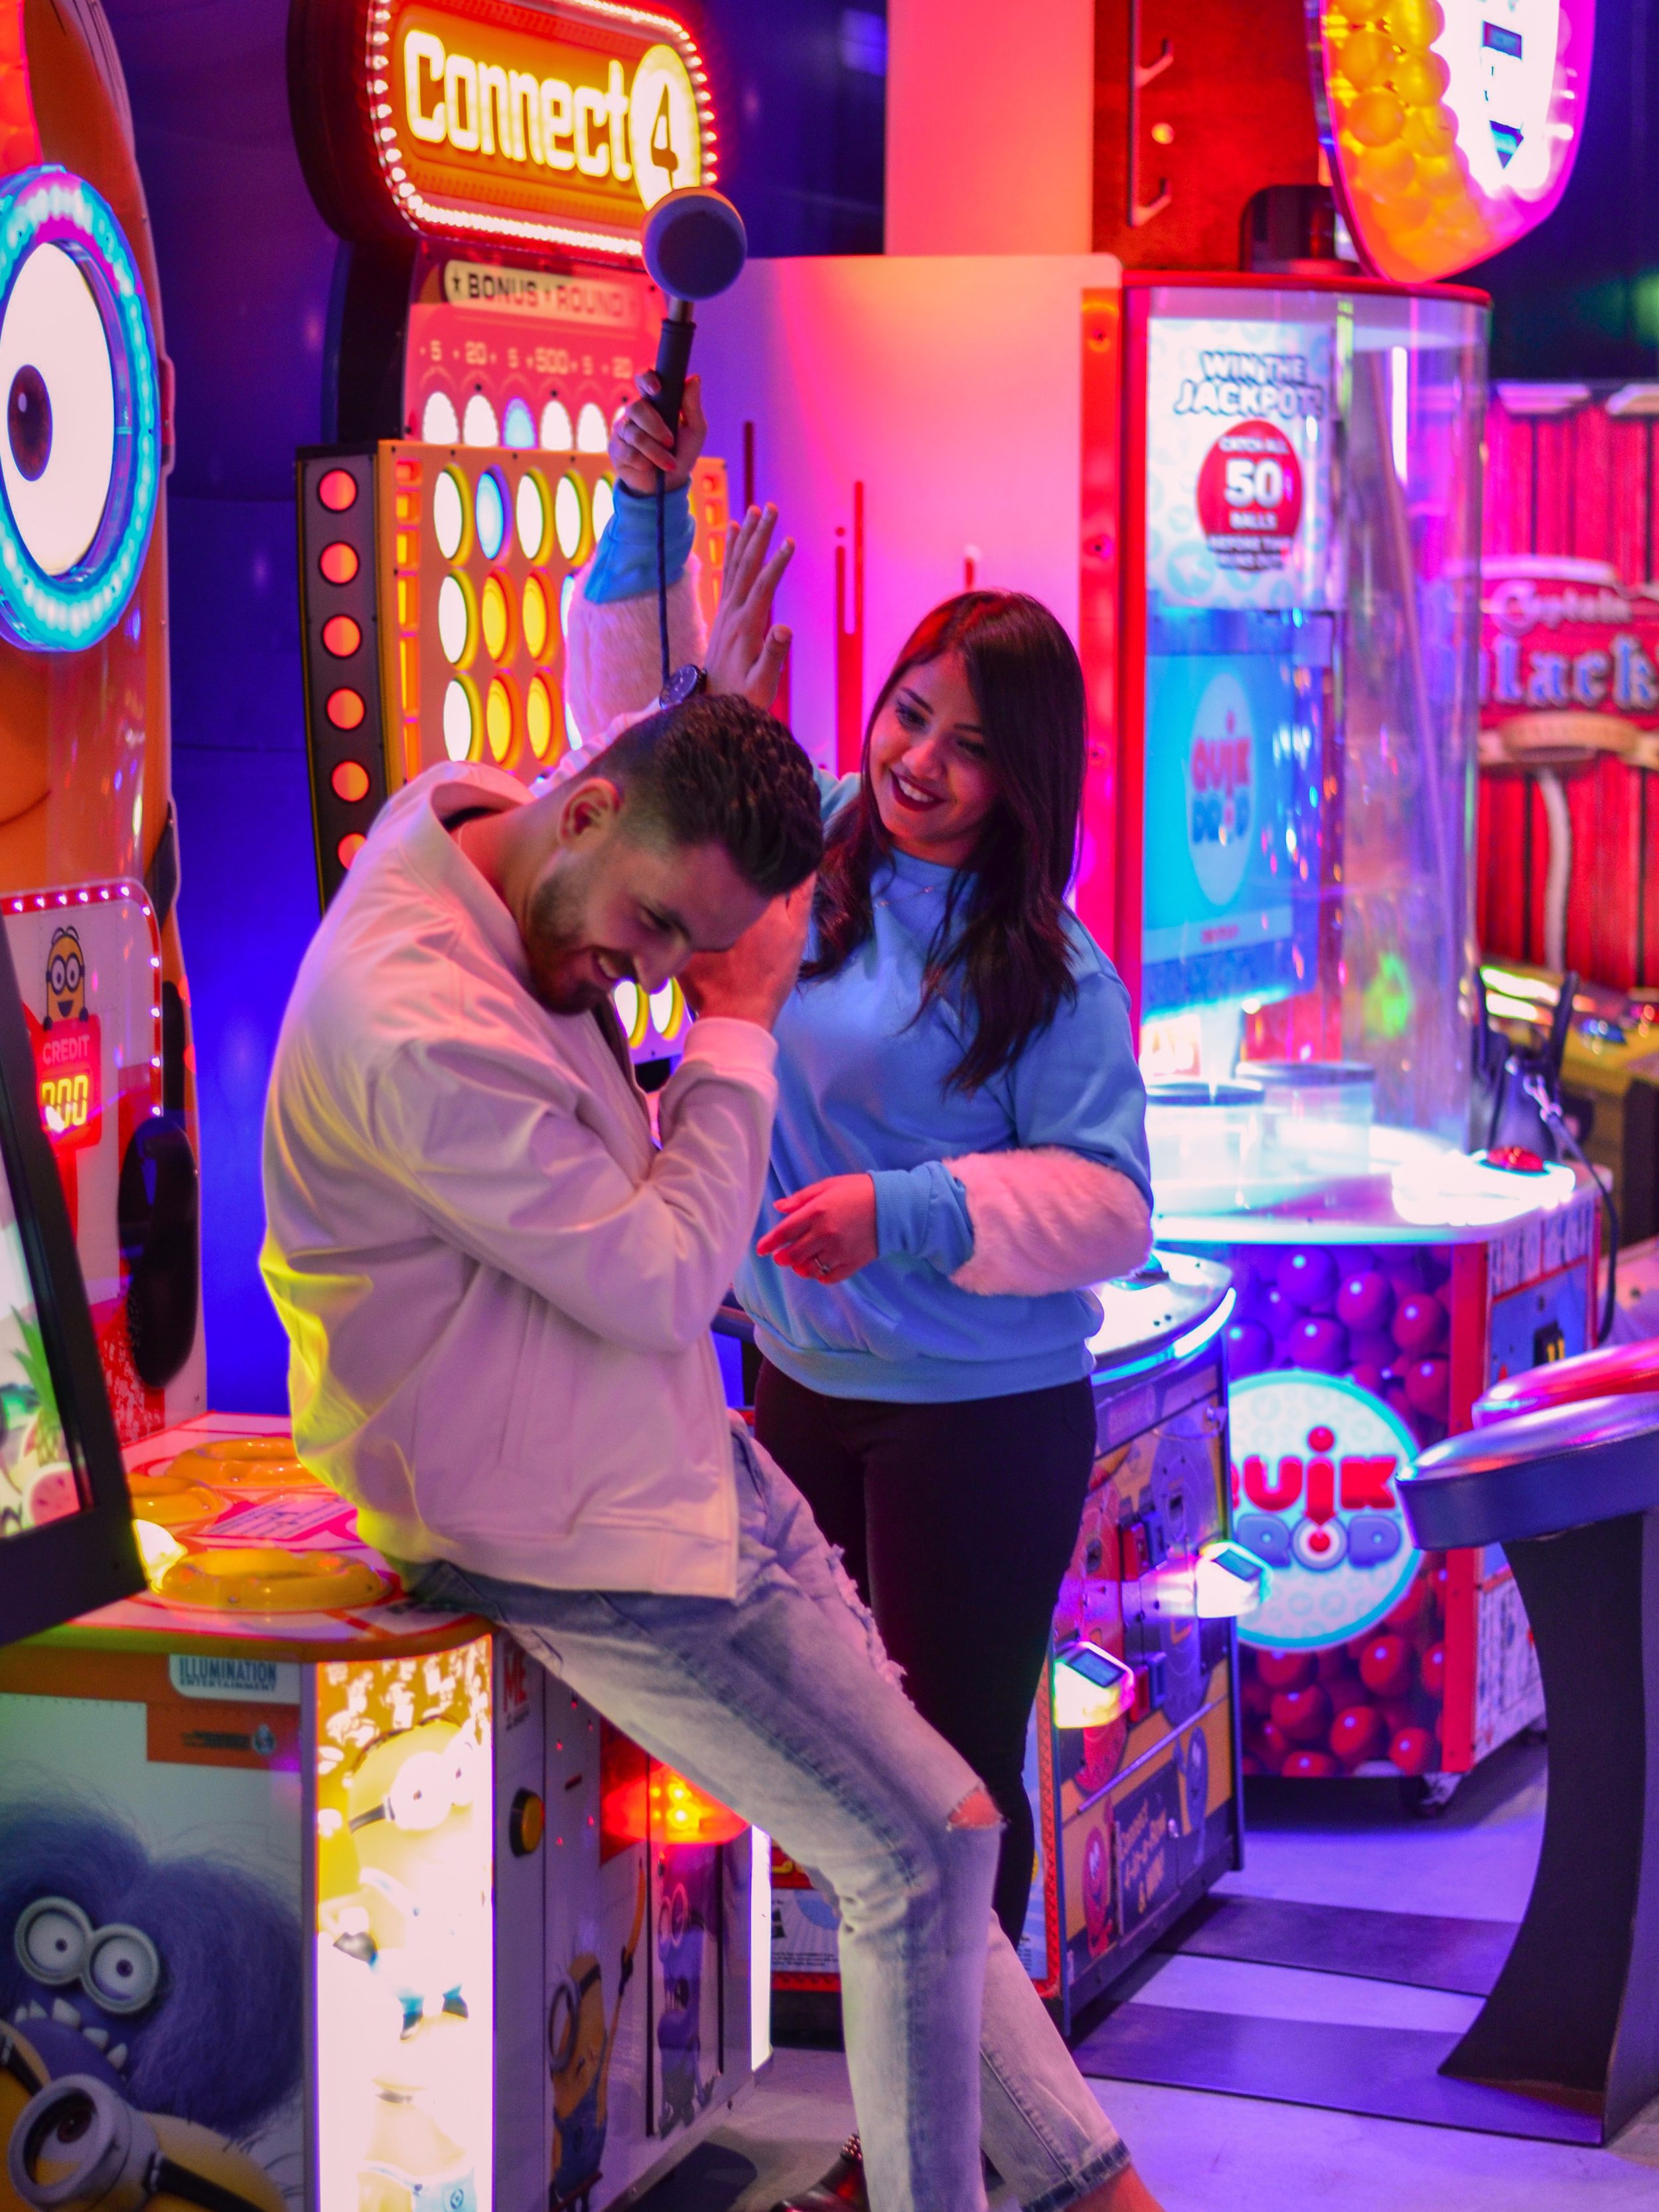 Fun Arcades Near Me : arcades, Arcade, Dates